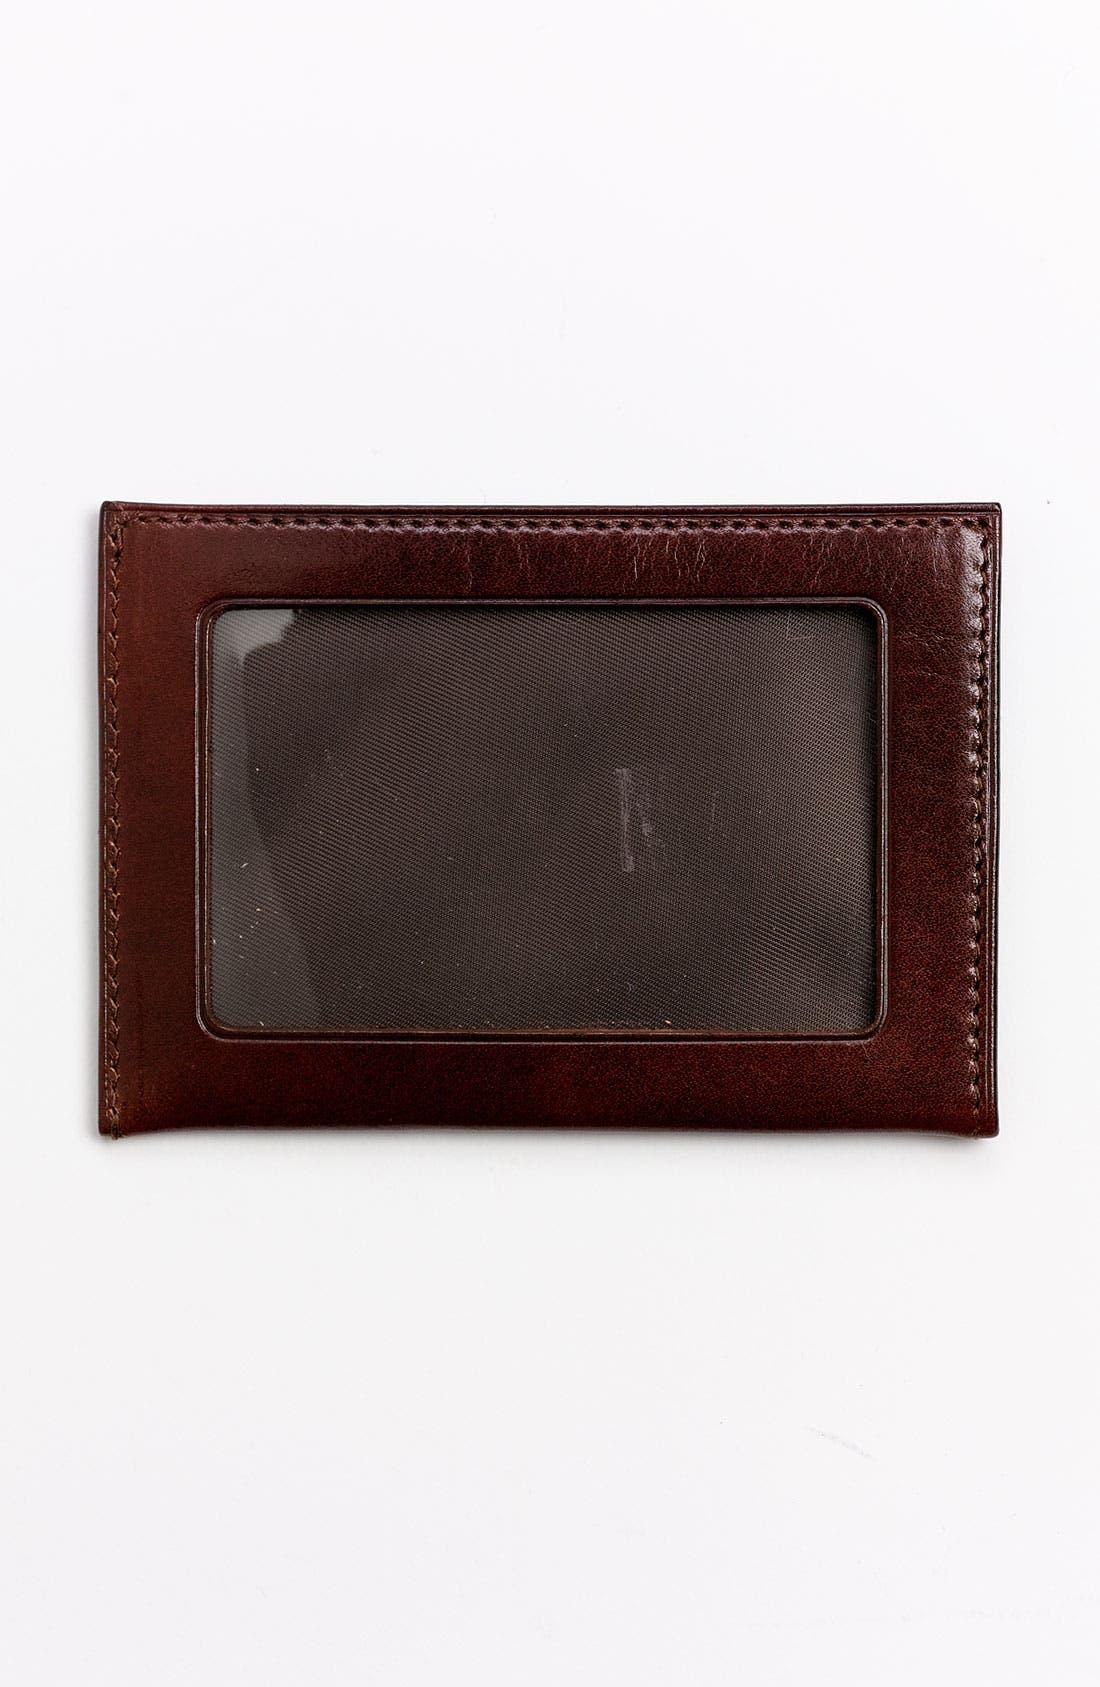 BOSCA,                             'Old Leather' Weekend Wallet,                             Alternate thumbnail 2, color,                             DARK BROWN